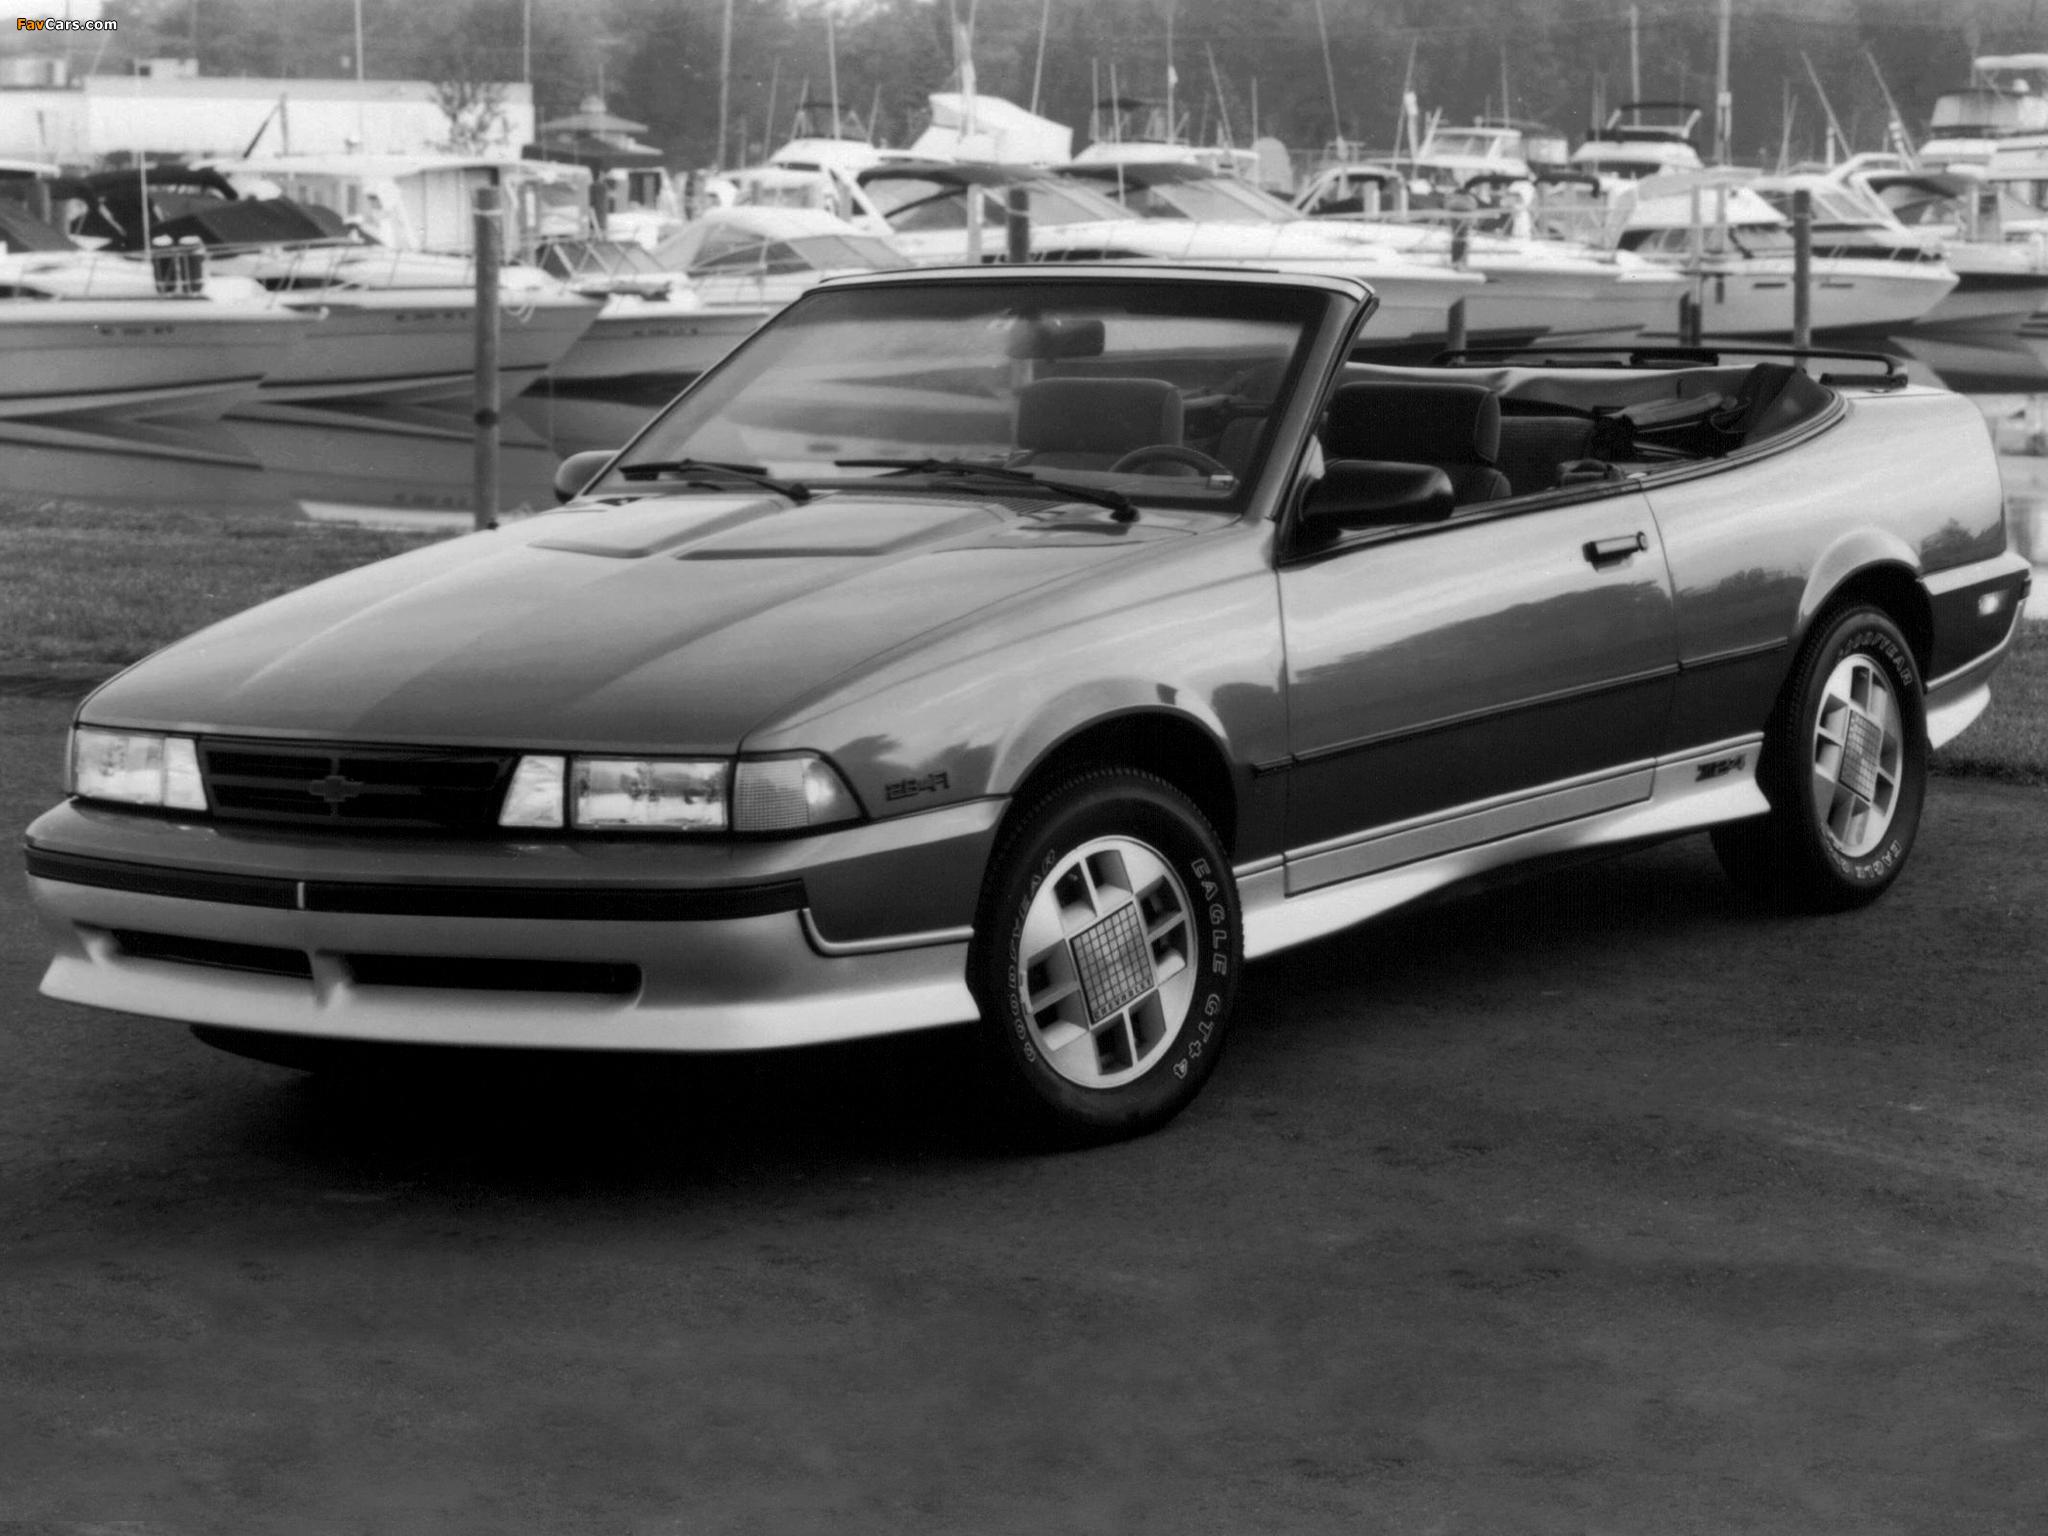 Chevrolet Cavalier Z24 Convertible 1988 images (2048x1536)